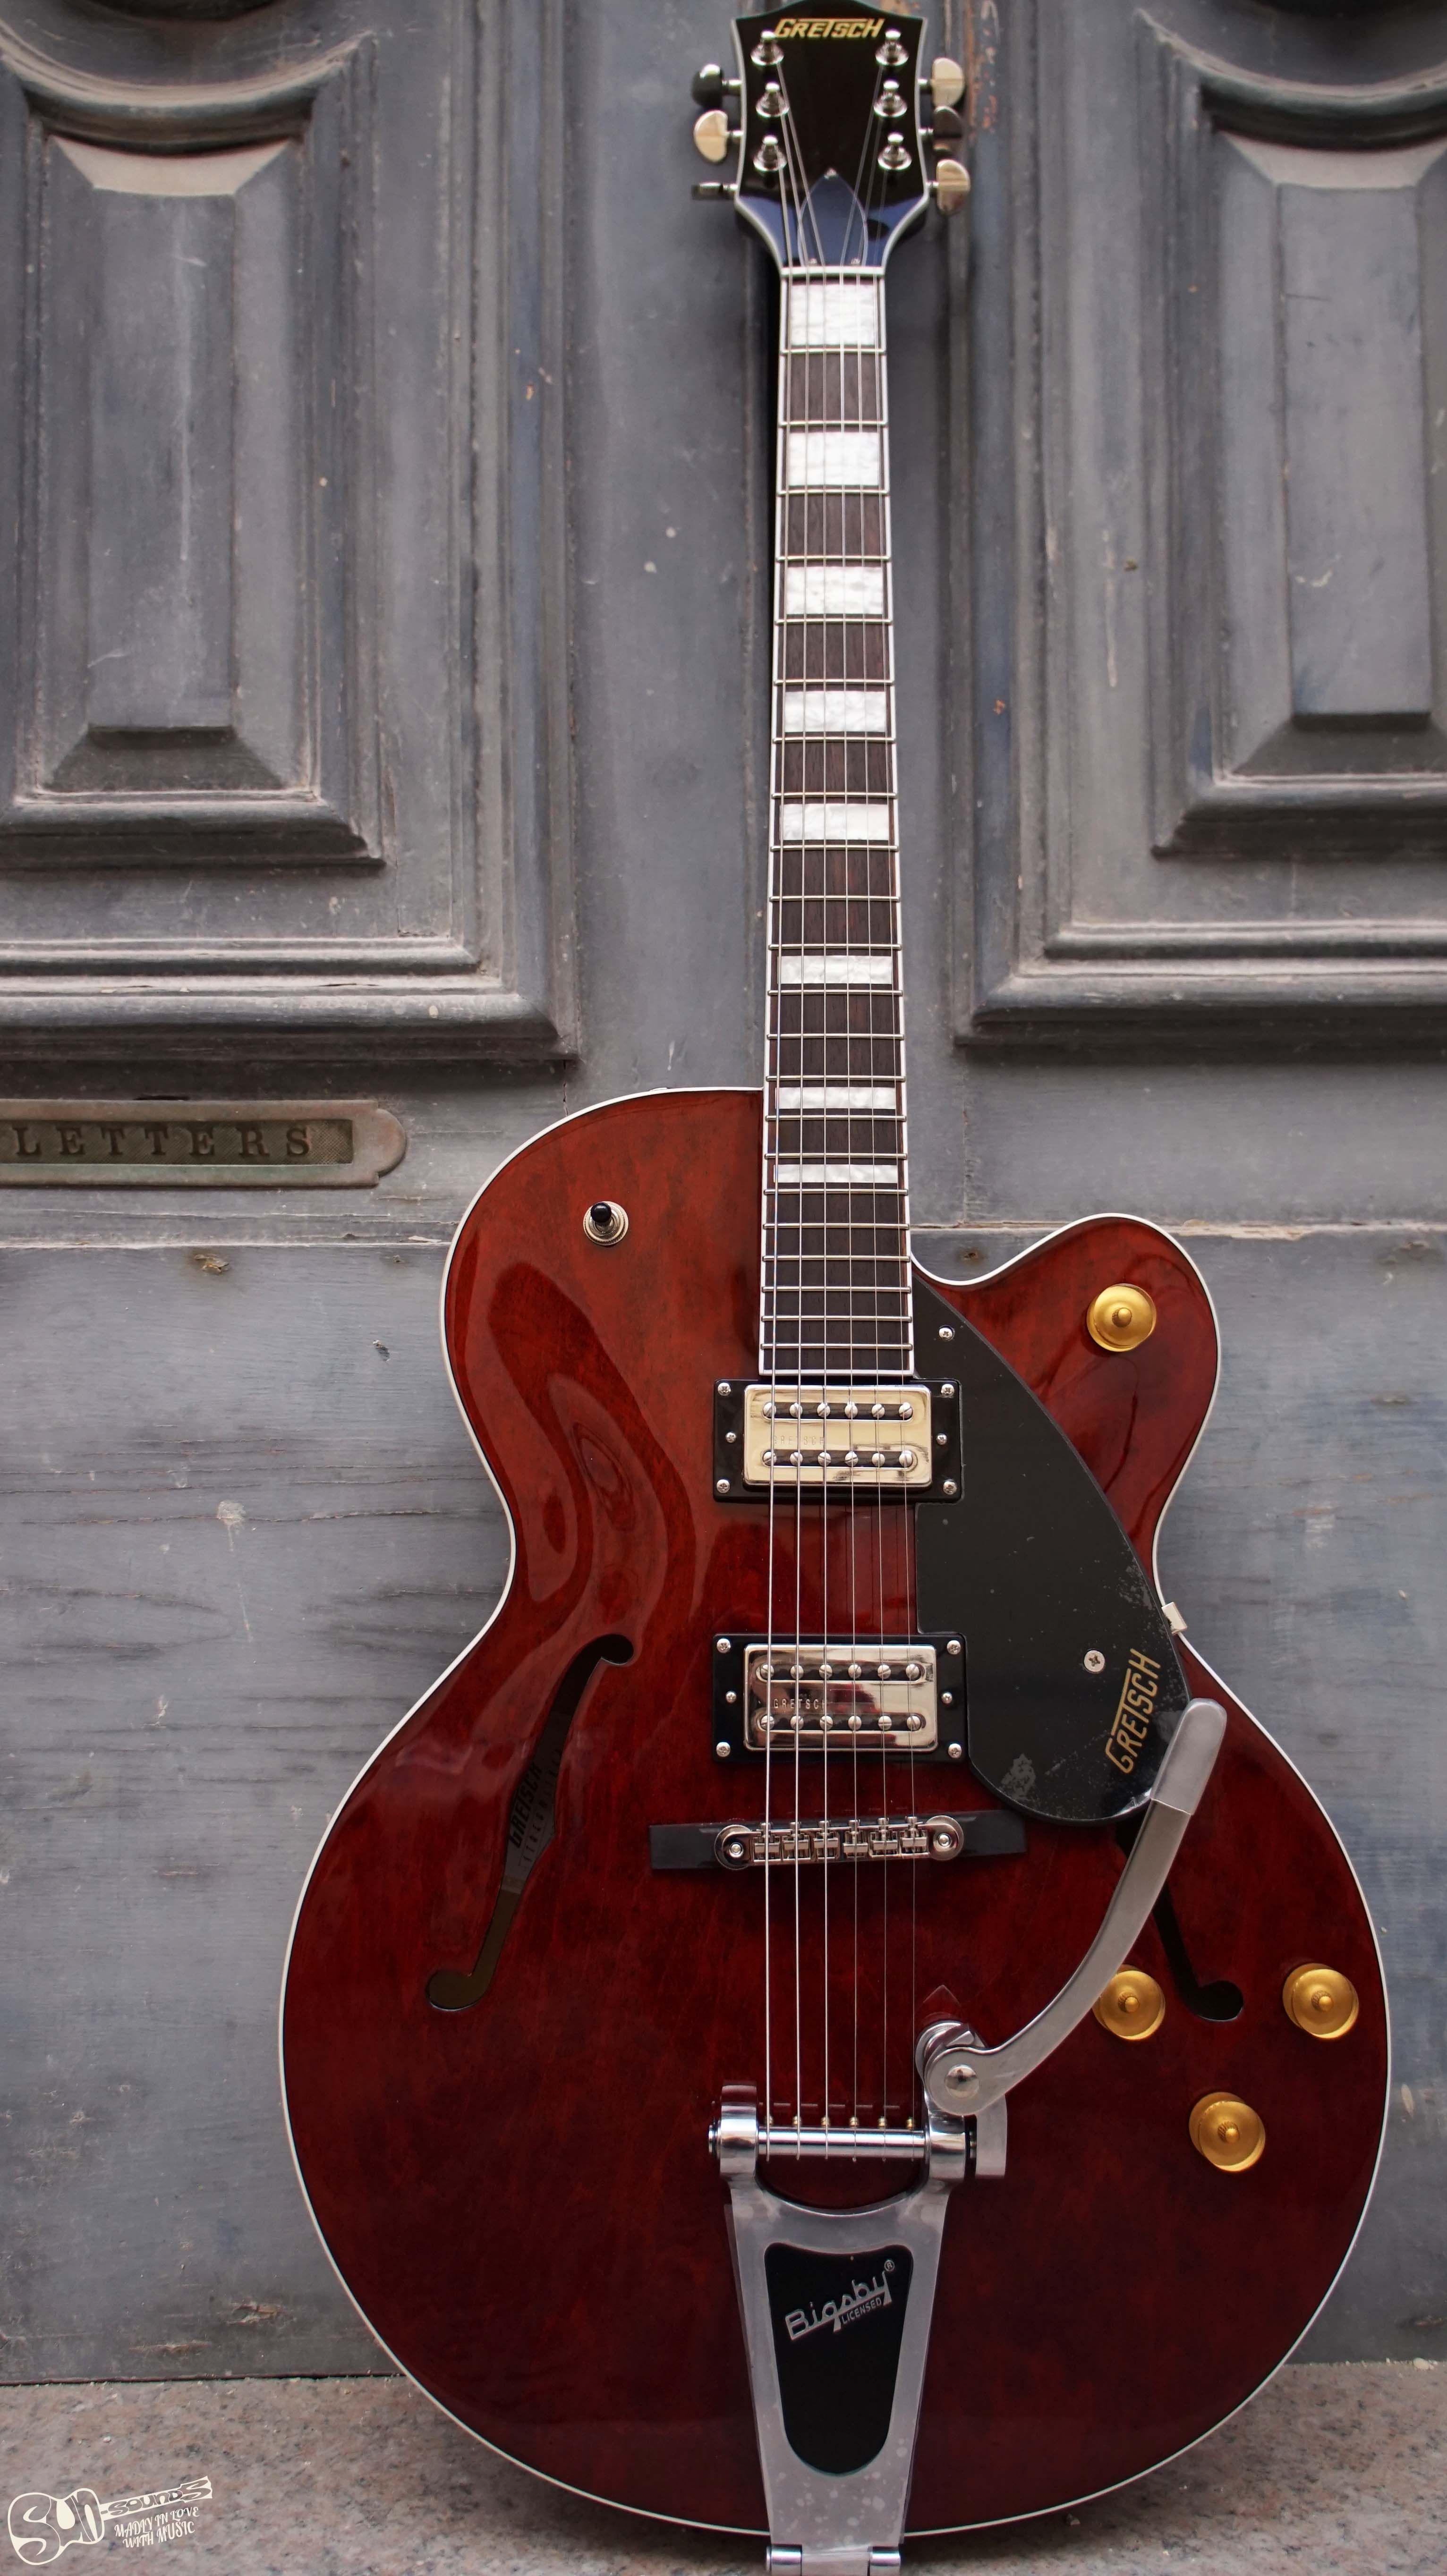 Gretsch Streamliner G2420T/WS Guitar, Gretsch